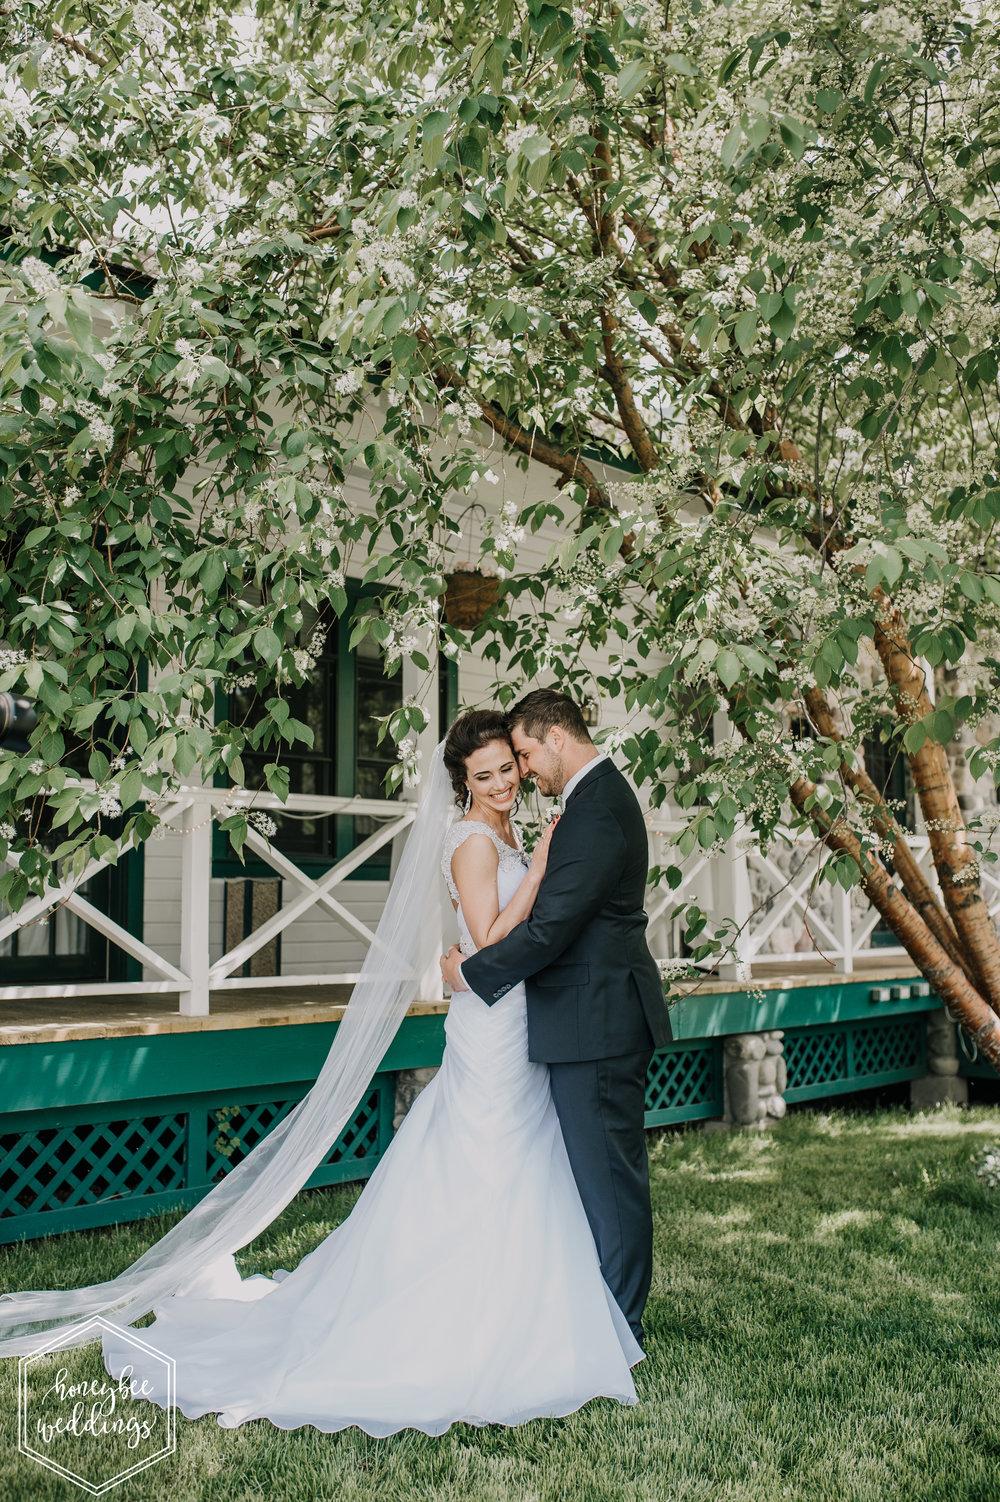 39 Chico Hotsprings Wedding_Bowdino 2018-2941-2.jpg